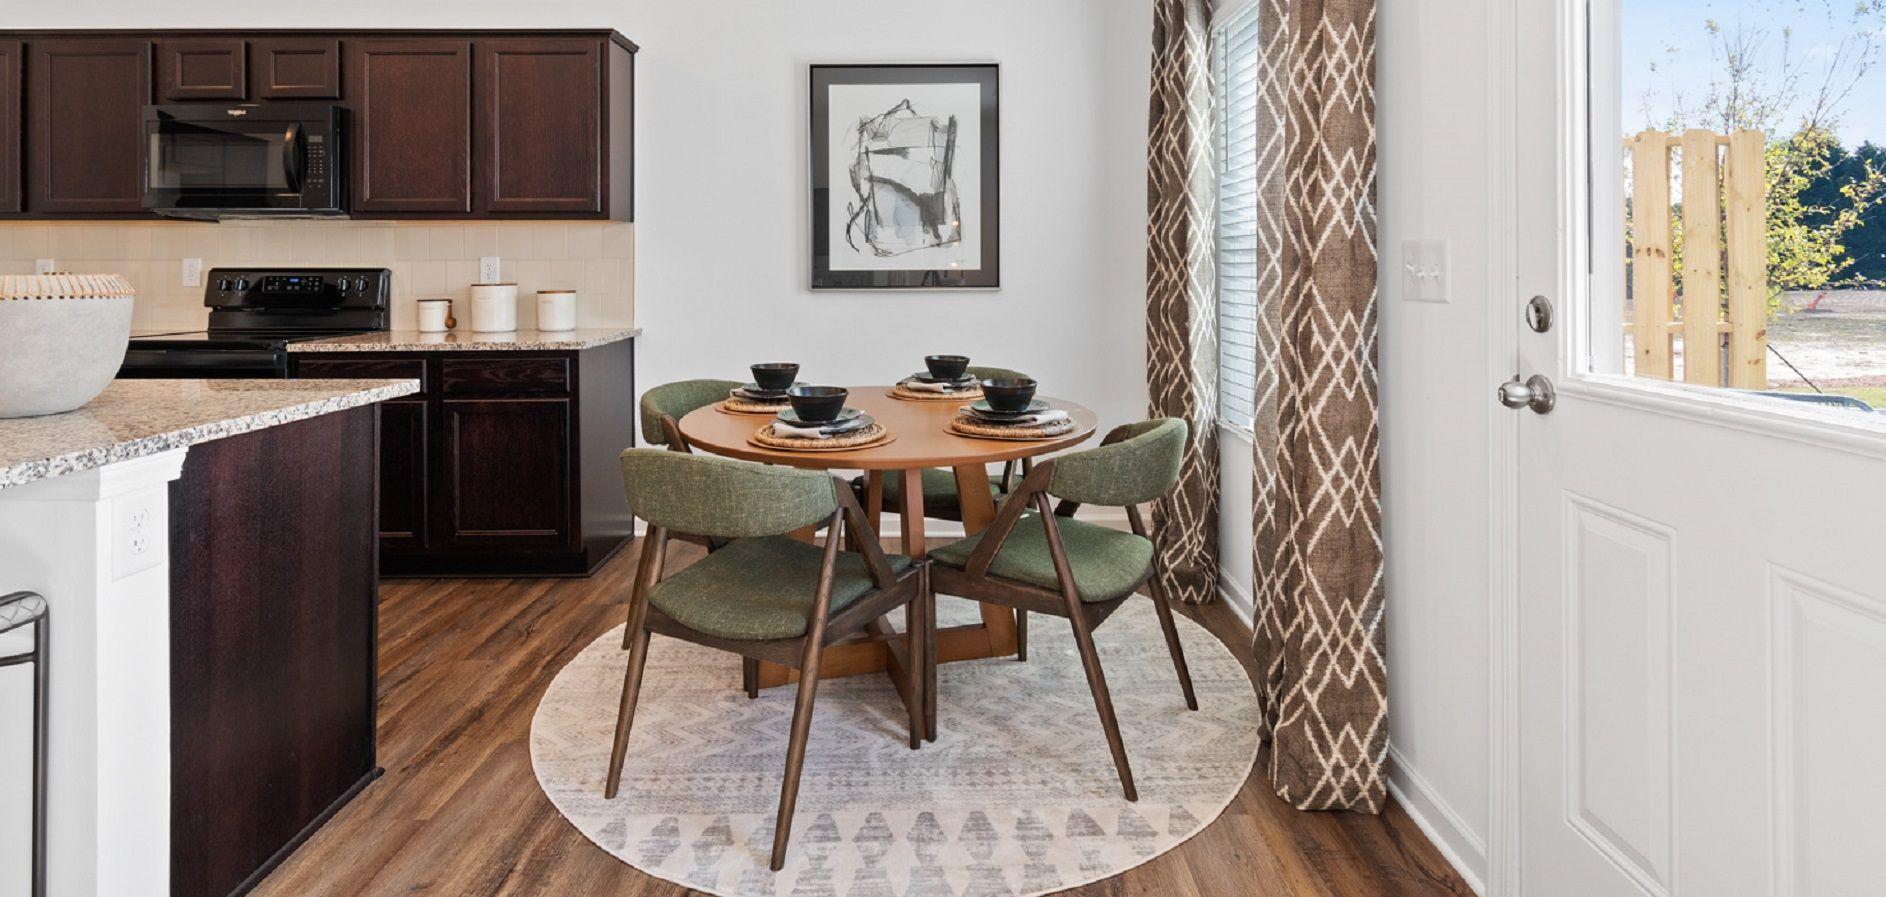 Kitchen featured in the Valetta By Ashton Woods in Atlanta, GA